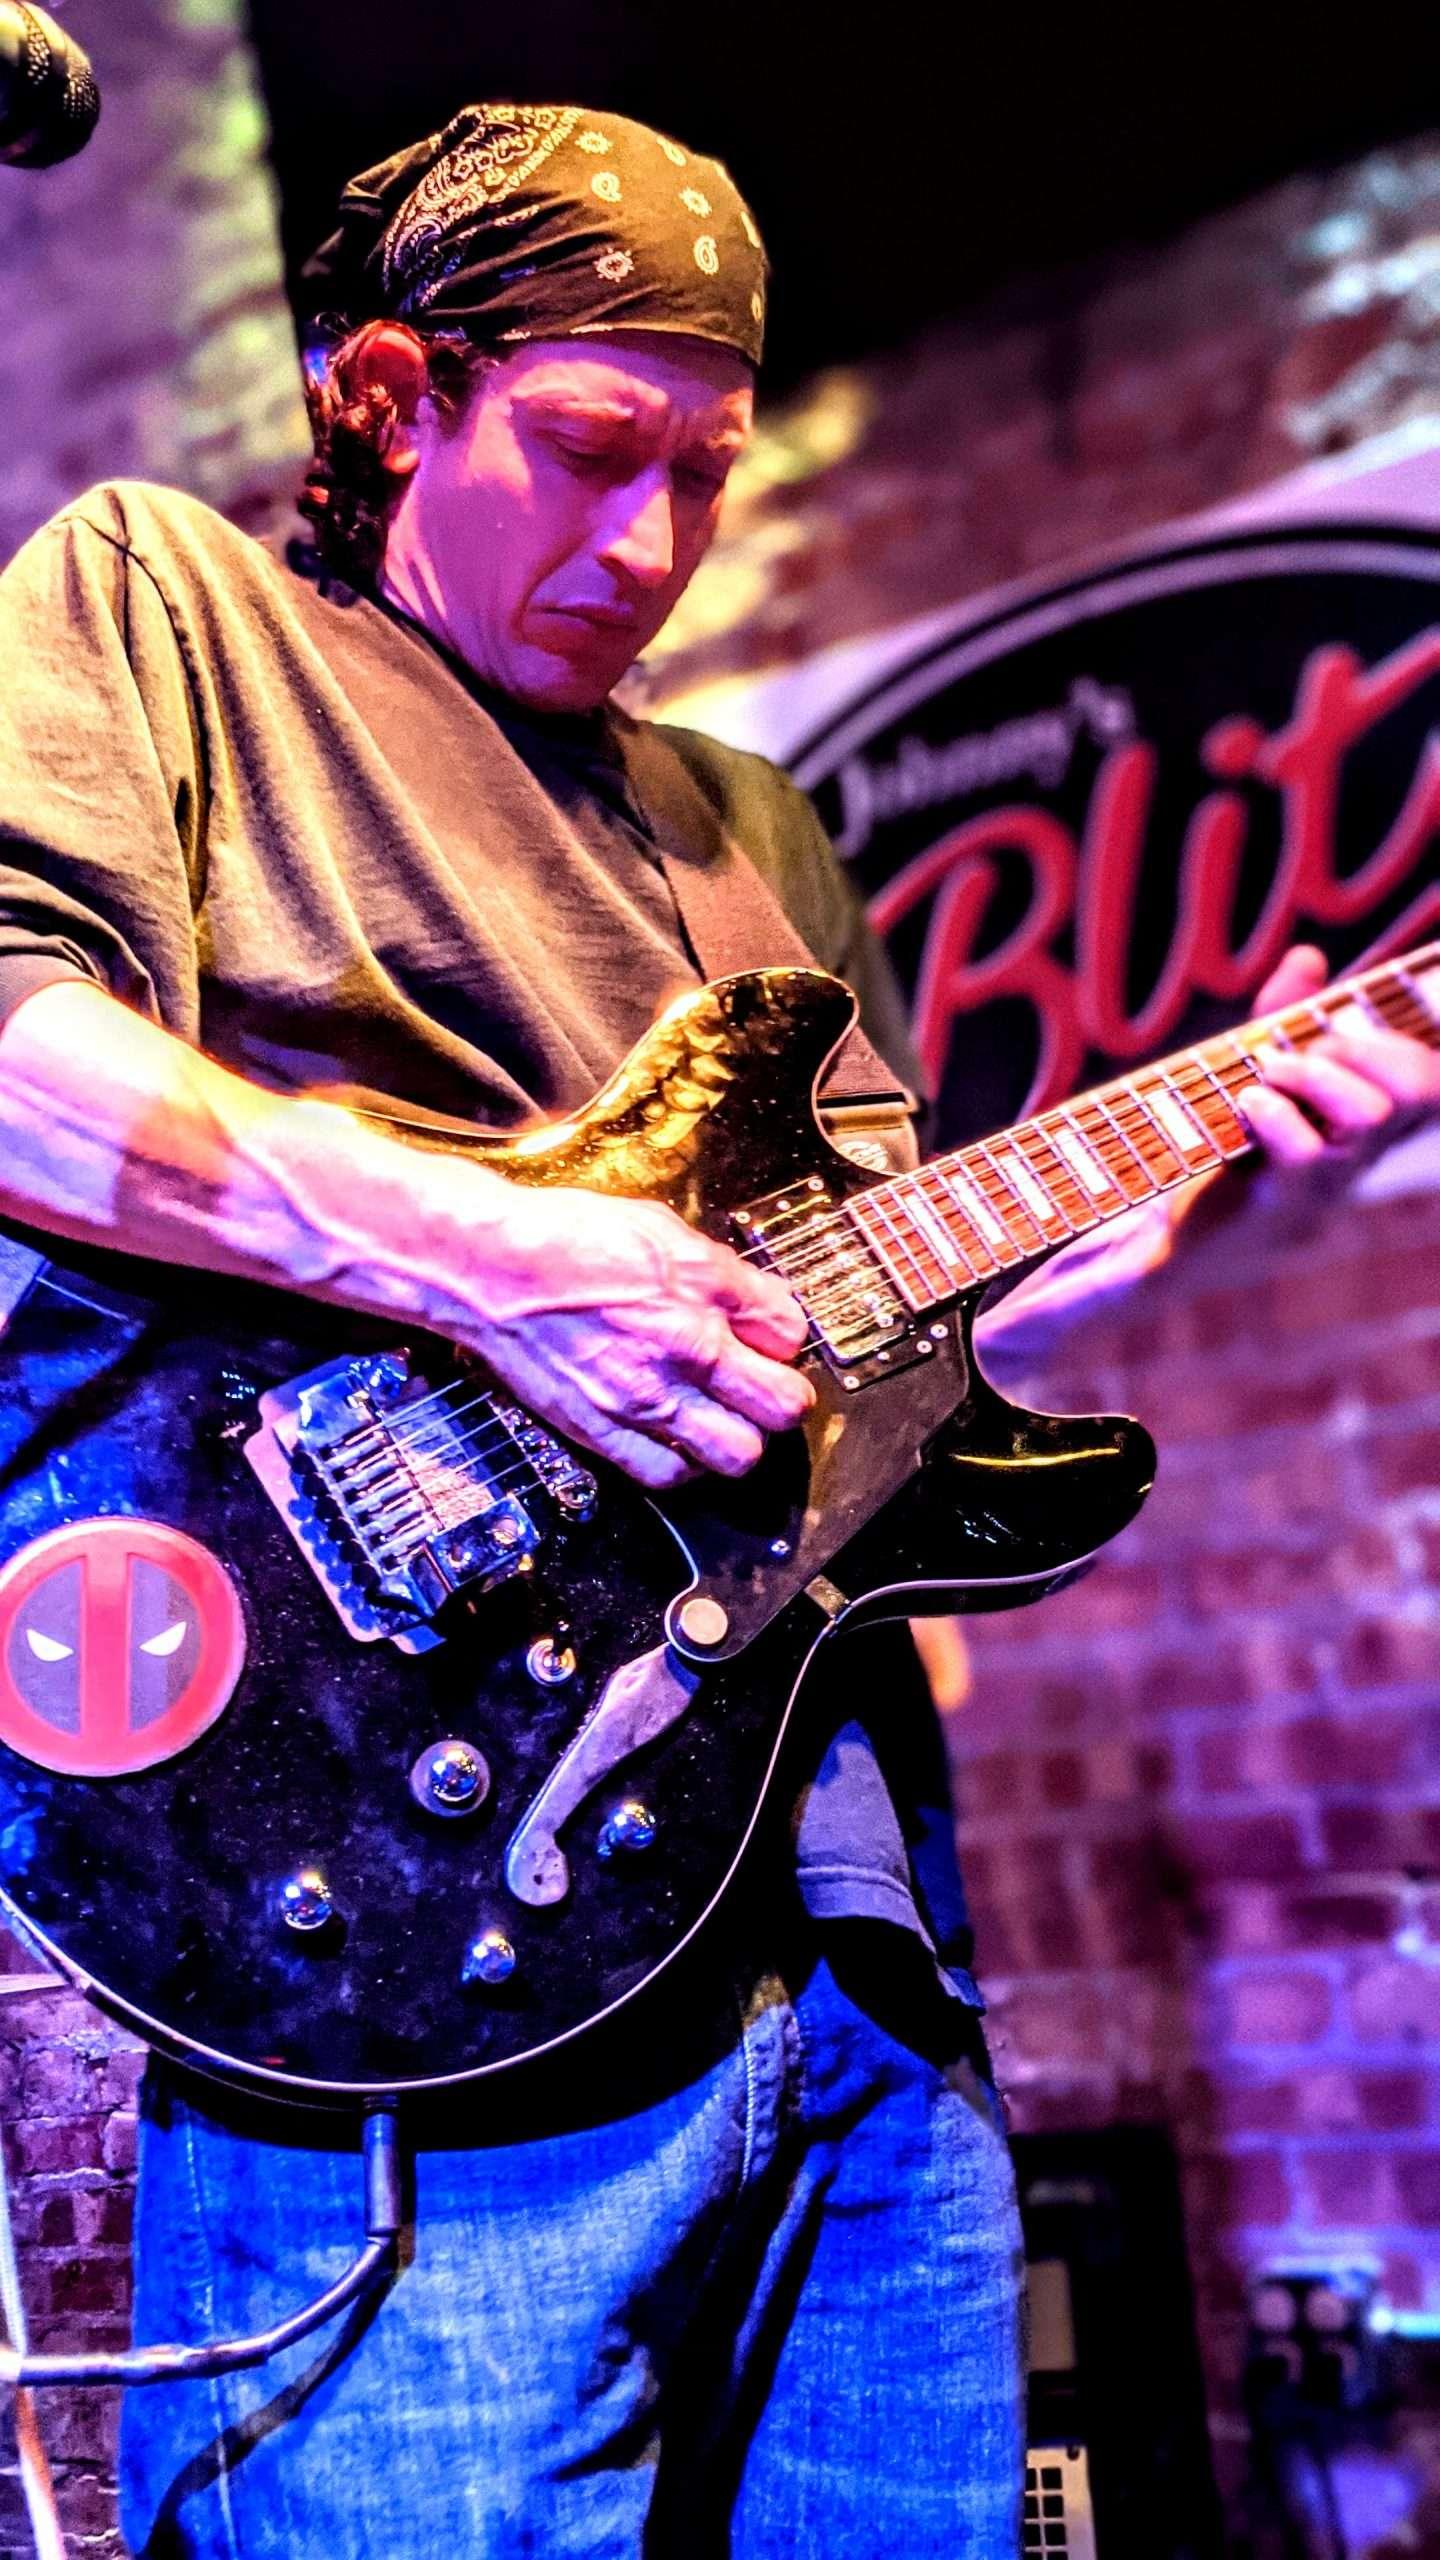 Brian's Open Mic Experiences At Johnny's Blitz Bar & Grill 42